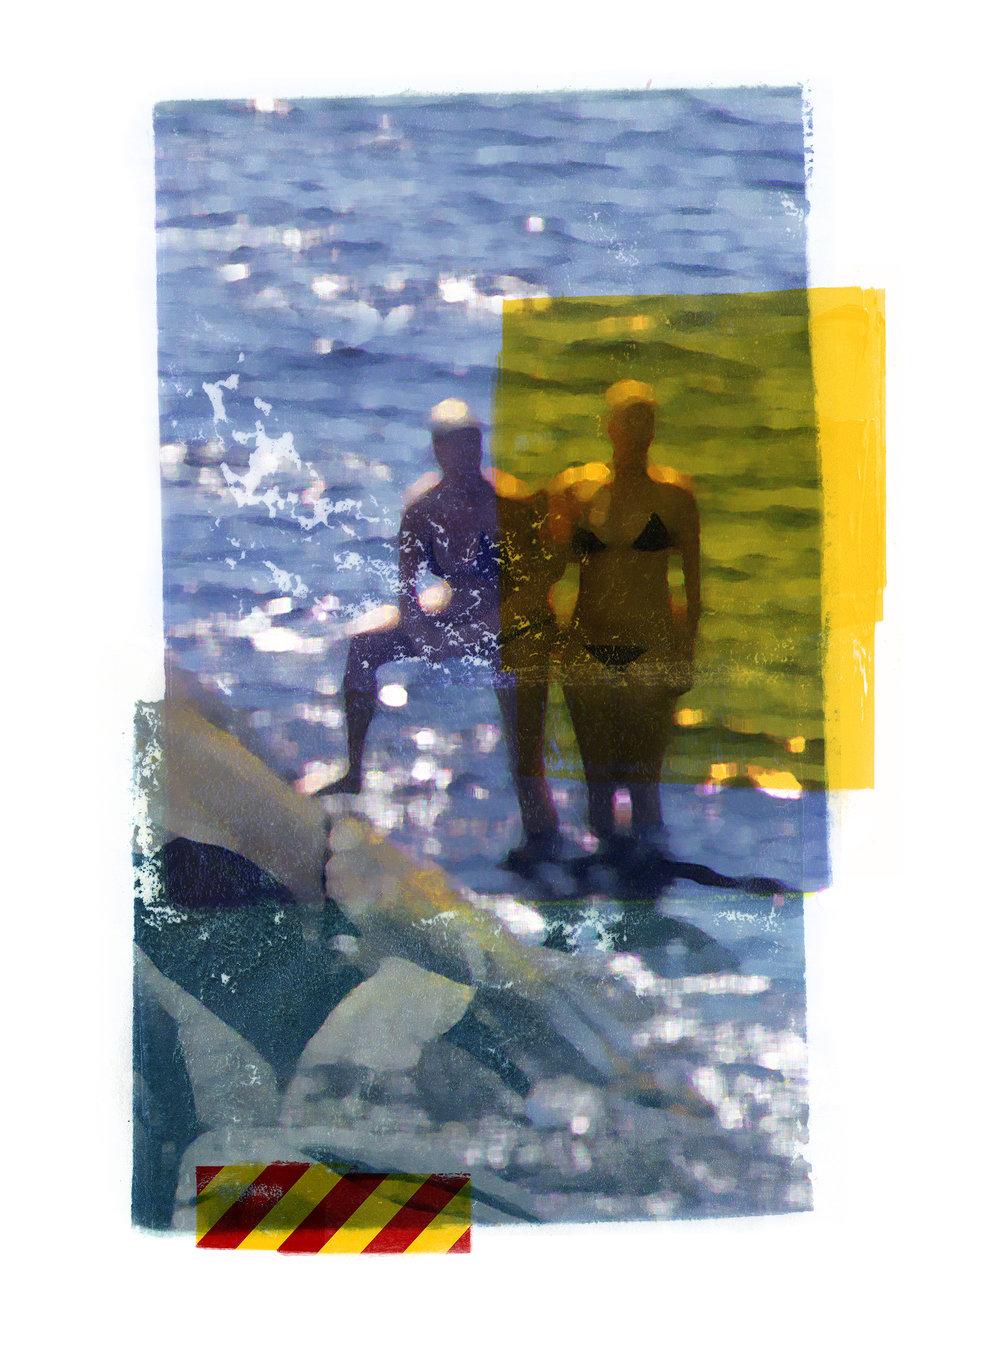 Zenit / Observation ( Melholmen)  Original pigment print / BFK rives 250 gr 56 x 76 cm / 22 x 30 in Edition of 50 + 7 Ap Editeur: Per Fronth Studios / Henrik Aunevik  14/2014: